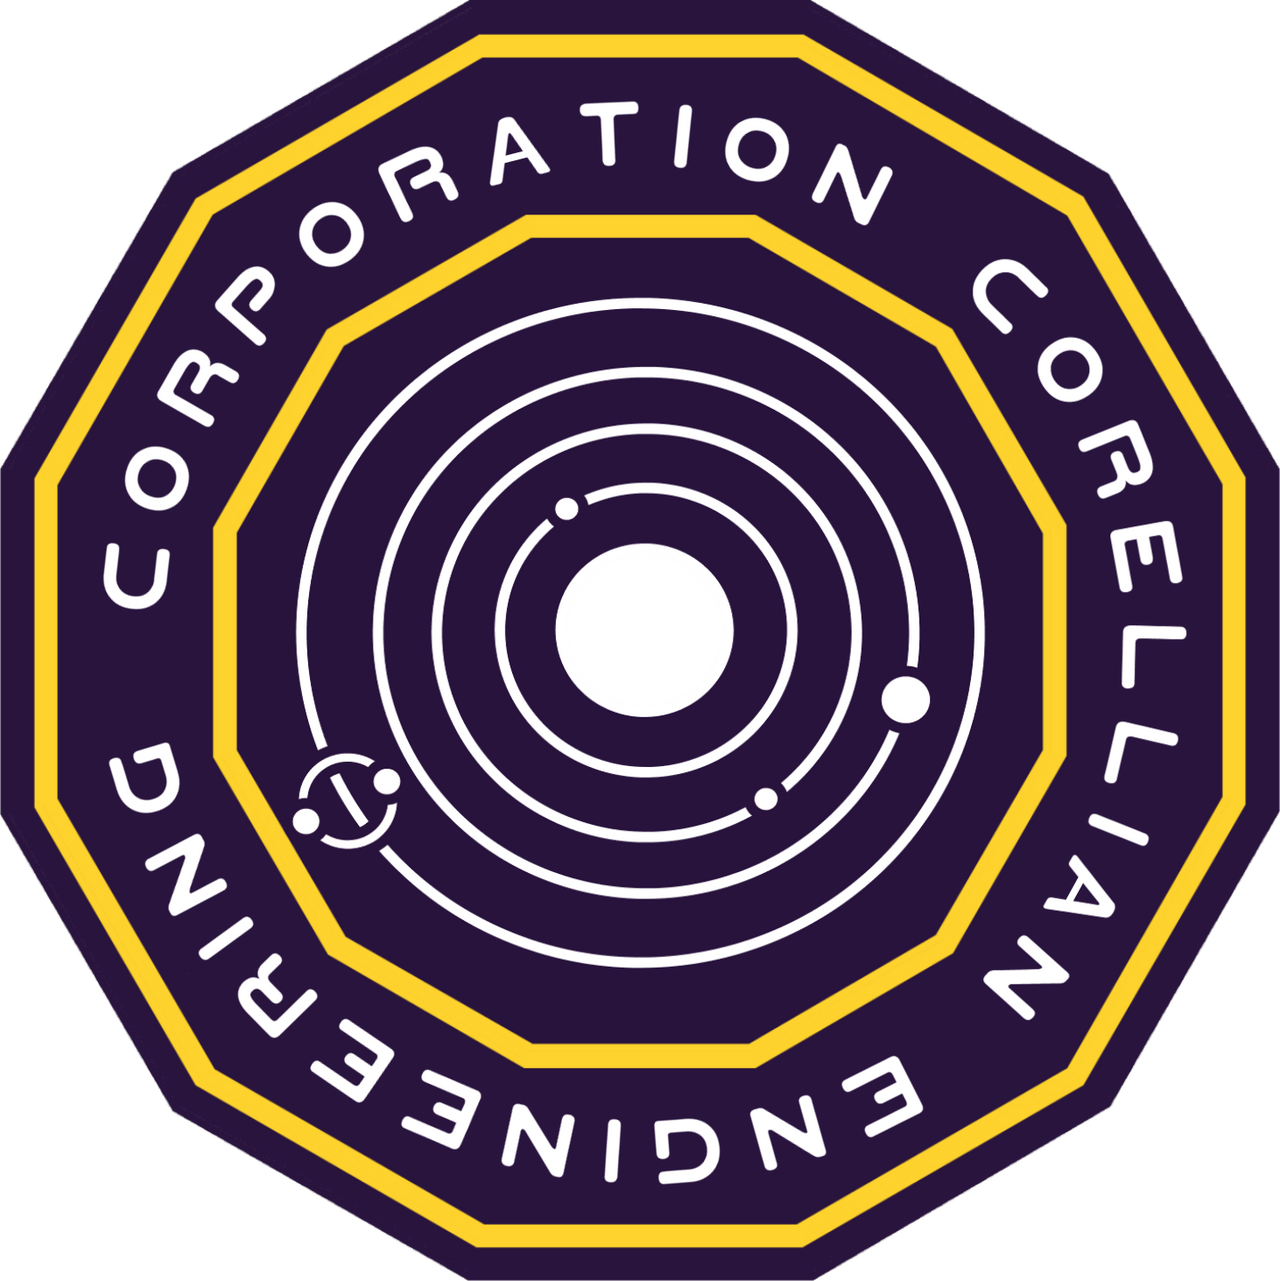 corellian engineering corporation logo  viperaviator  deviantart